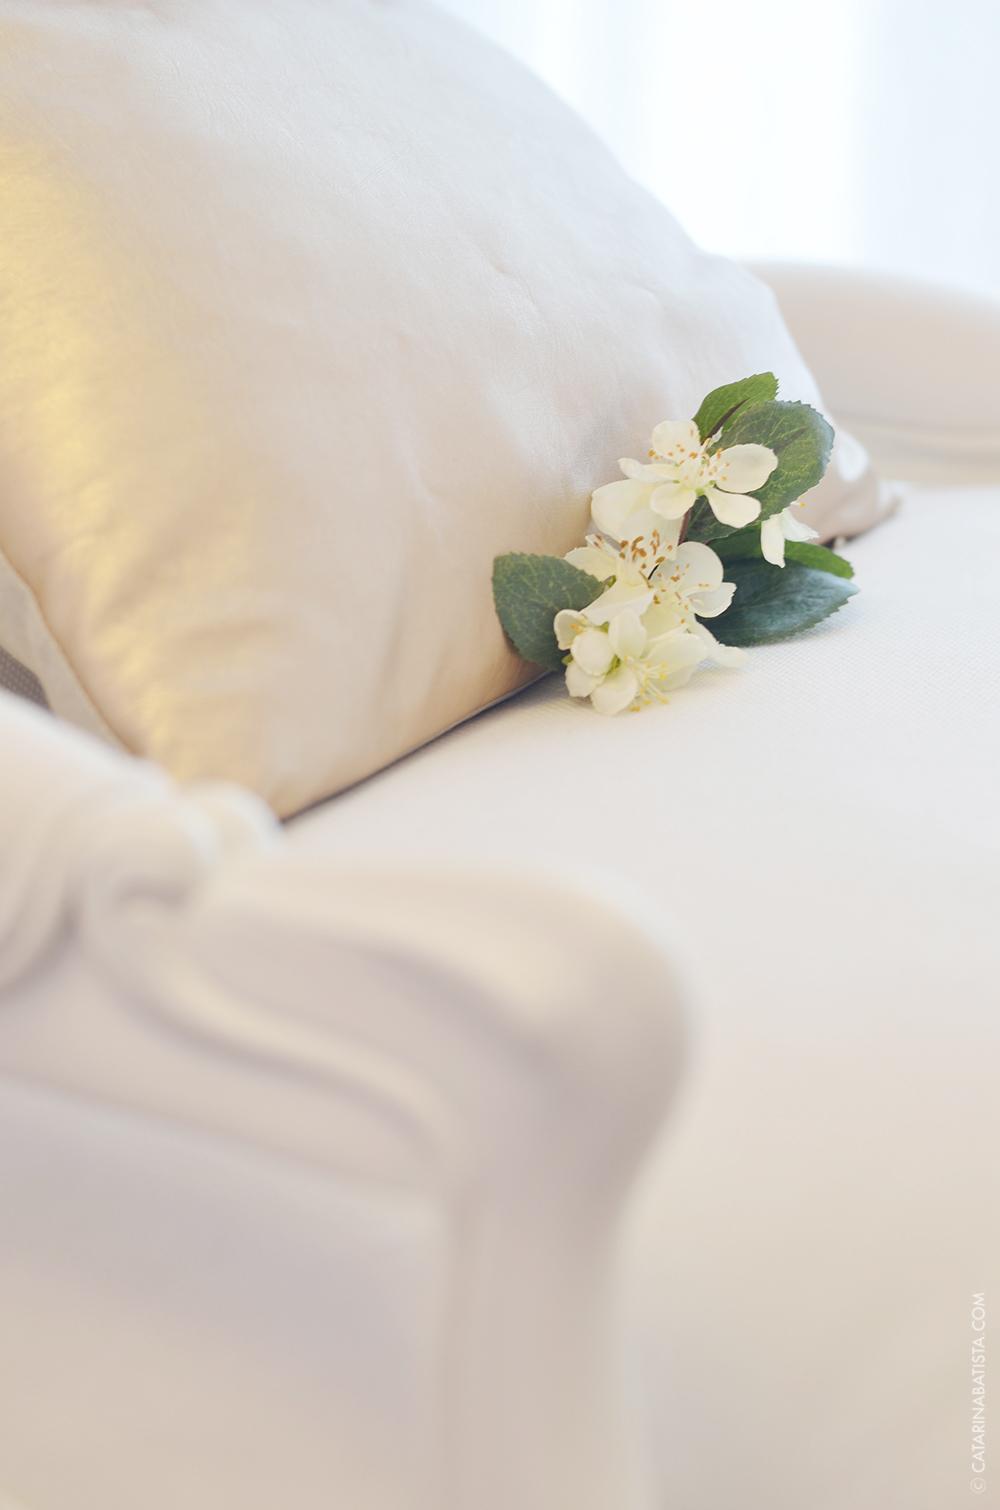 47-catarina-batista-arquitectura-design-interior-decoracao--apartamento-quarto-bedroom-livingroom-sala.jpg